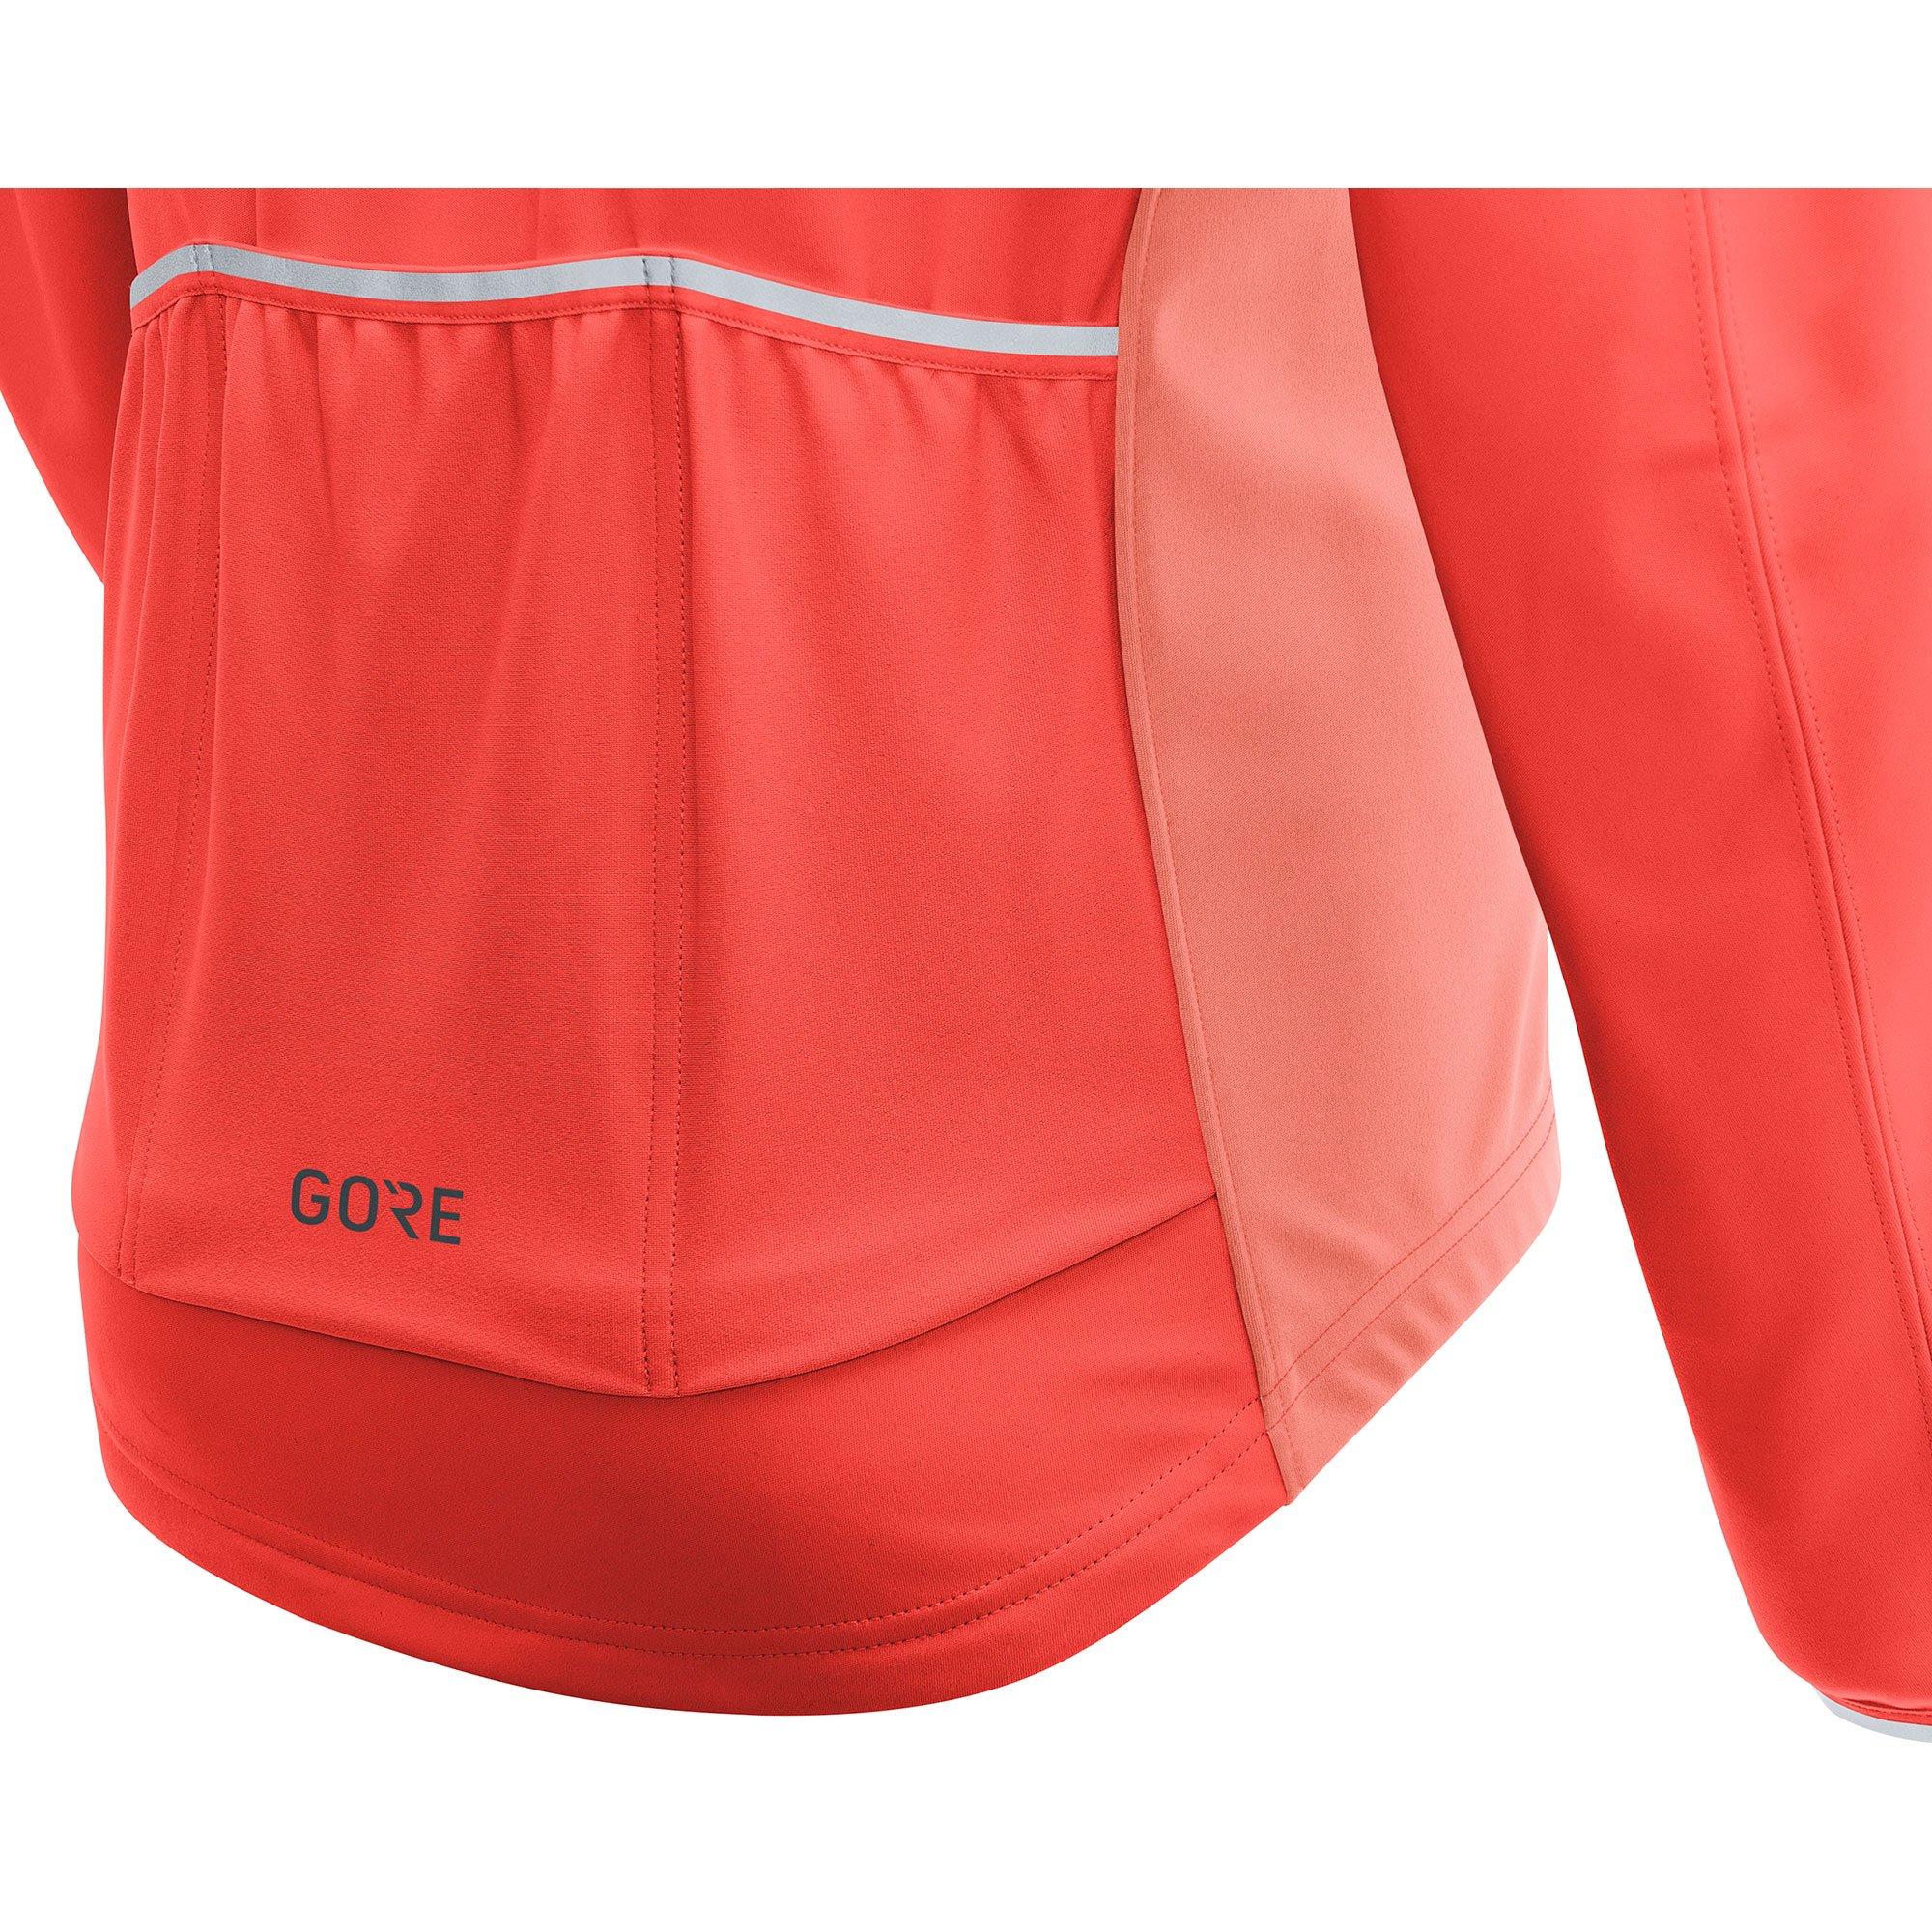 GORE Wear Women's Windproof Cycling Jacket, Removable Sleeves, GORE Wear C3 Women's GORE Wear WINDSTOPPER Phantom Zip-Off Jacket, Size: M, Color: Lumi Orange/Coral Glow, 100191 by GORE WEAR (Image #8)